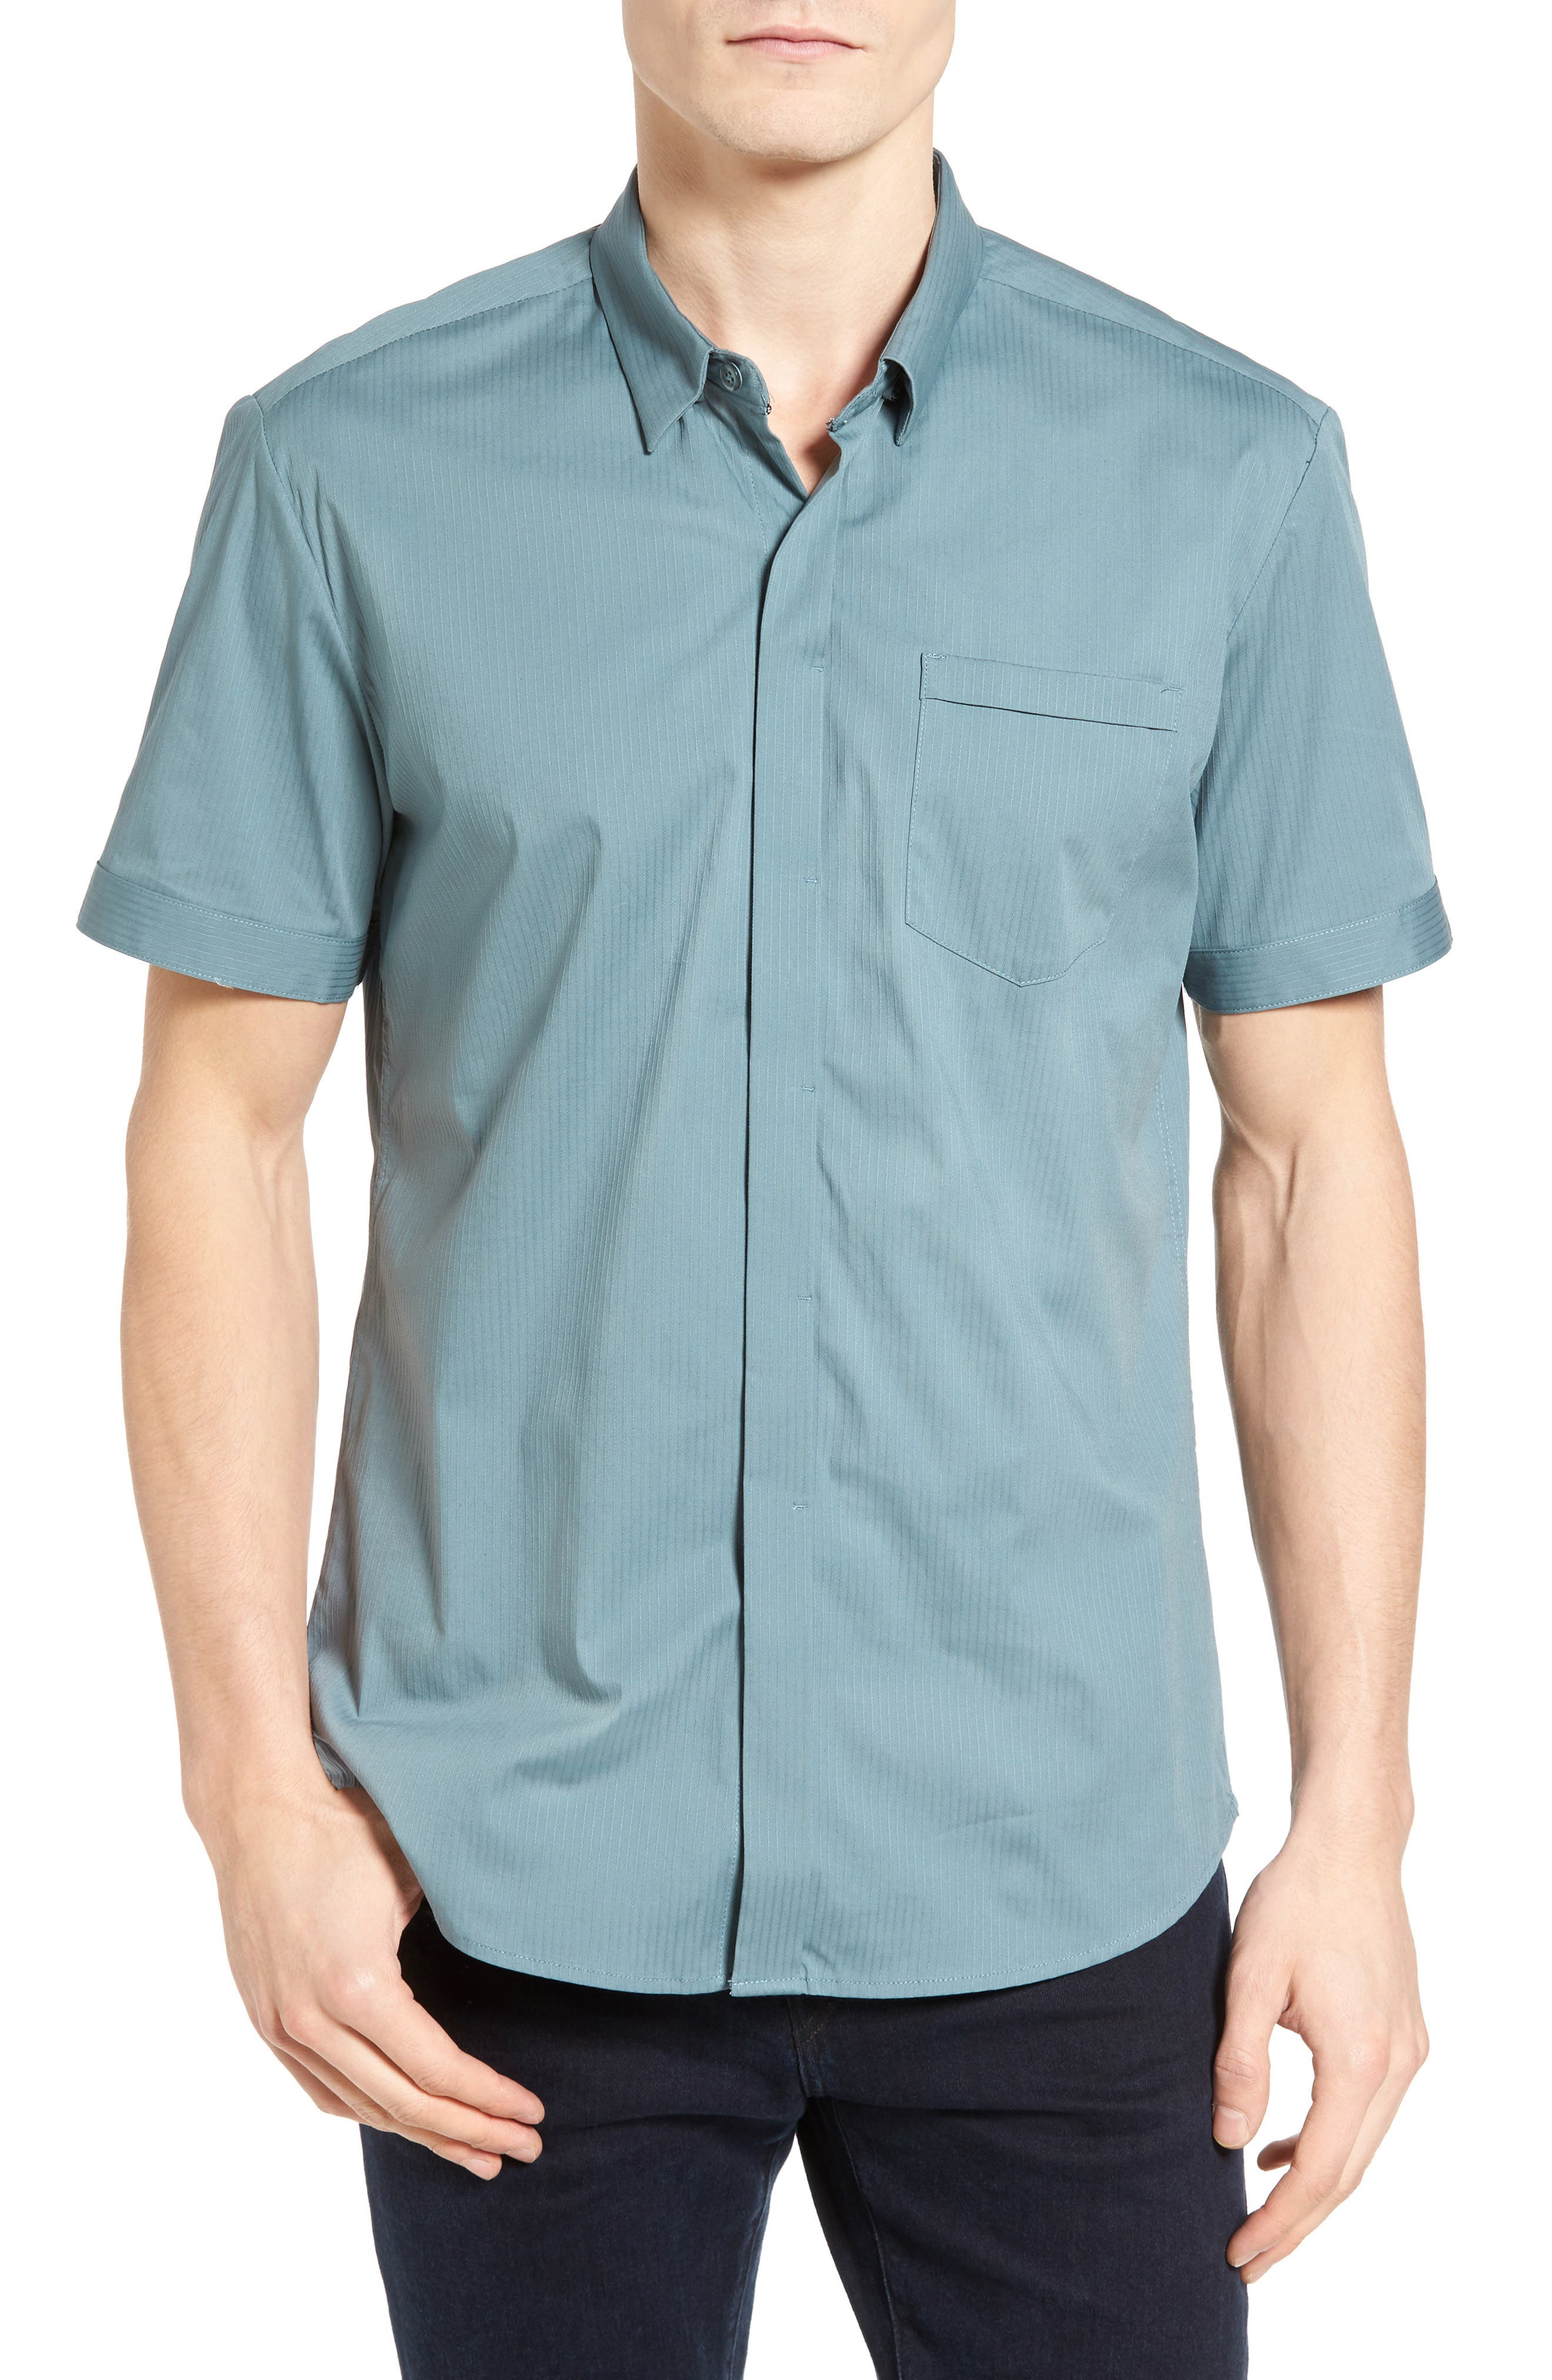 City Savior Woven Shirt,                         Main,                         color, Stormy Sea